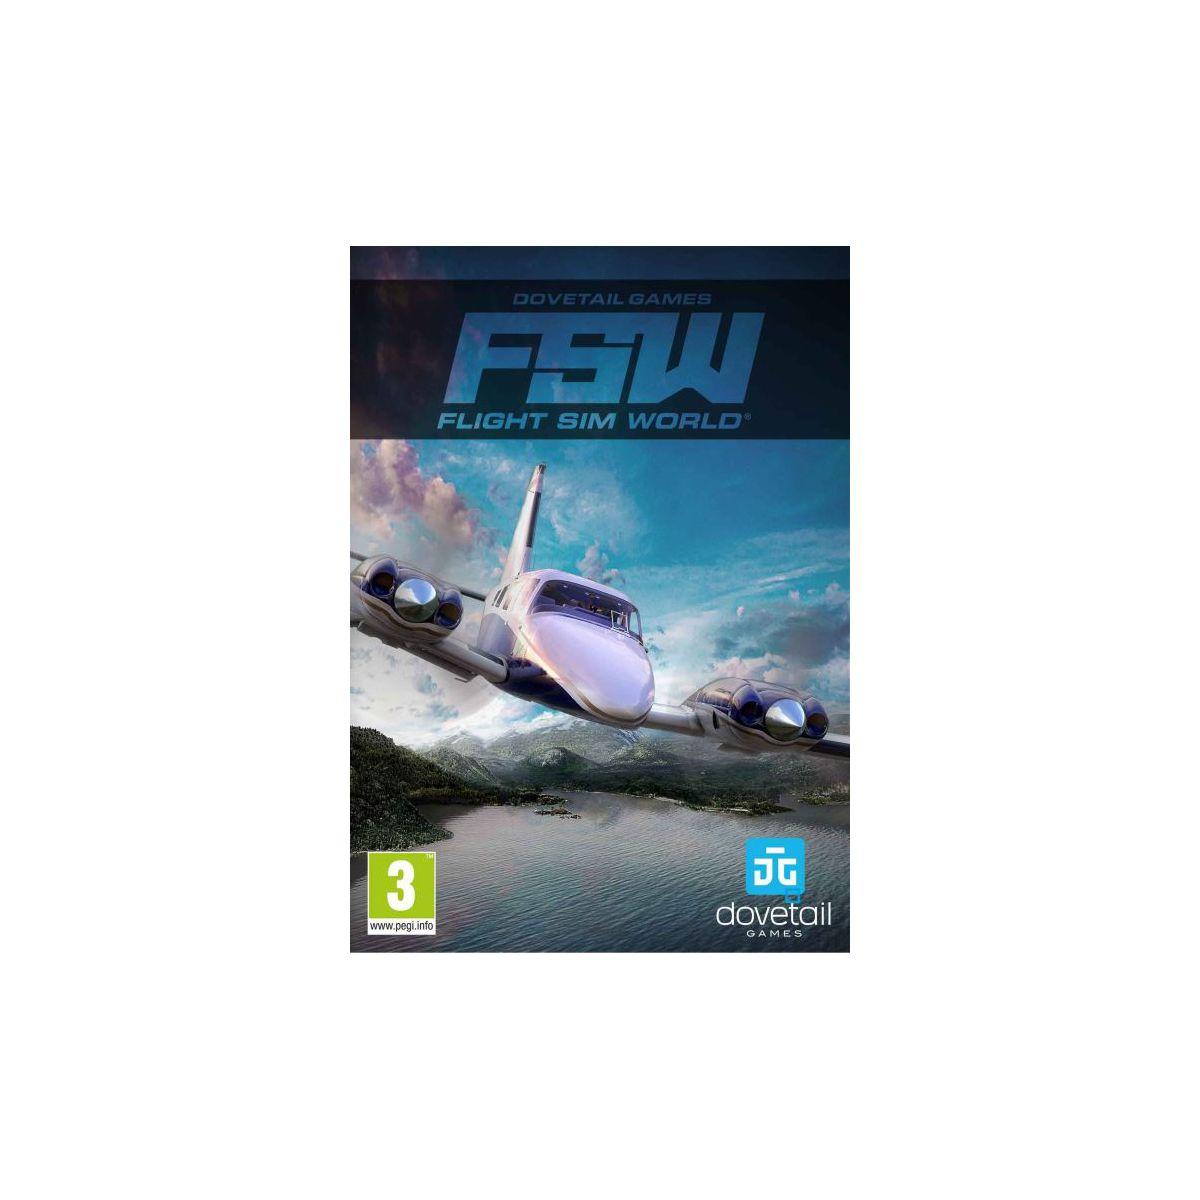 Jeu PC JUST FOR GAMES Flight Sim World (photo)